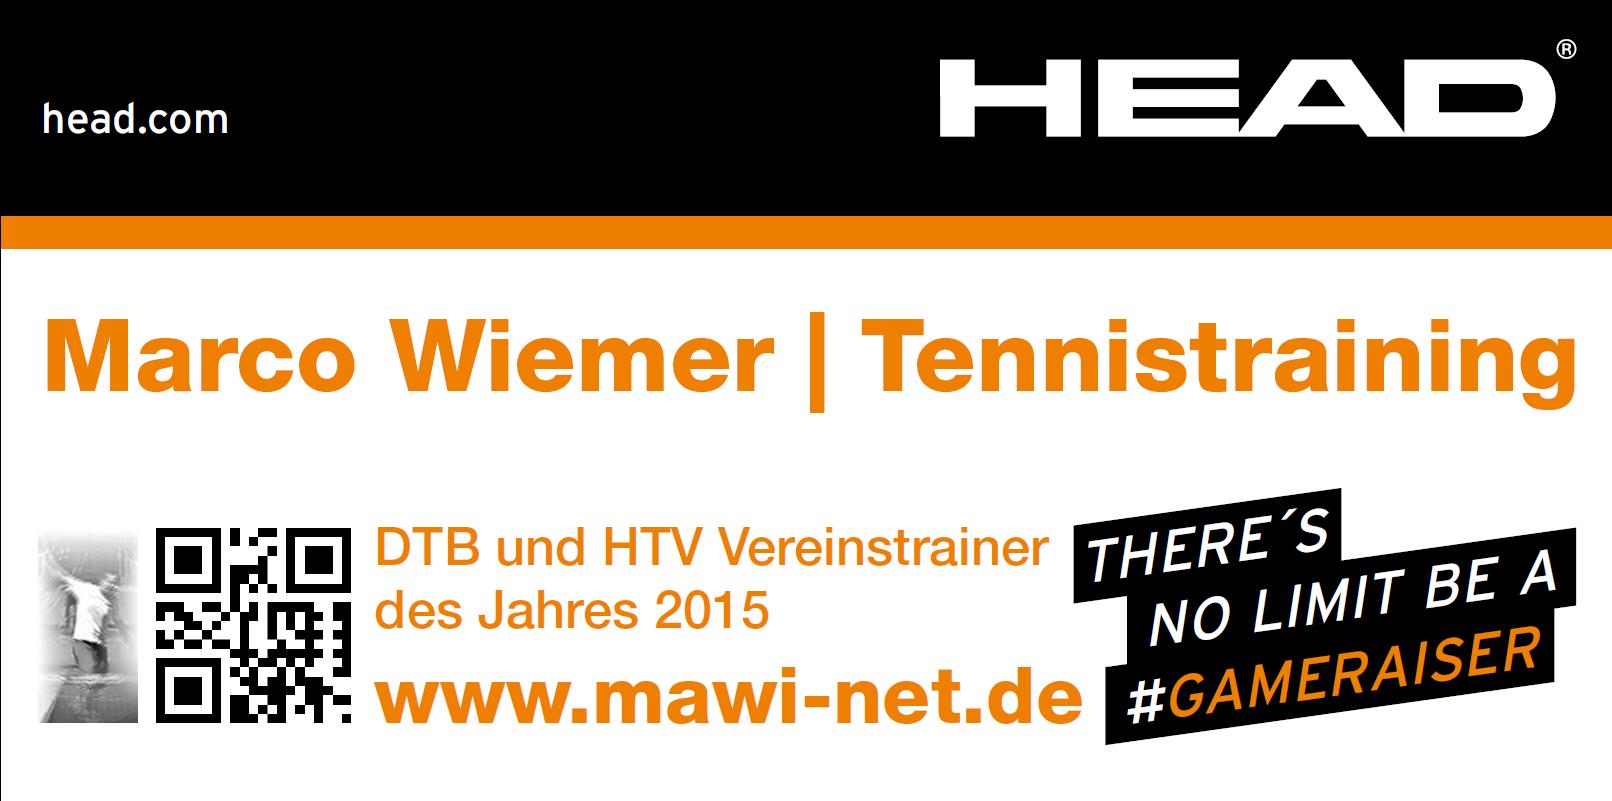 Marco Wiemer | Tennistraining